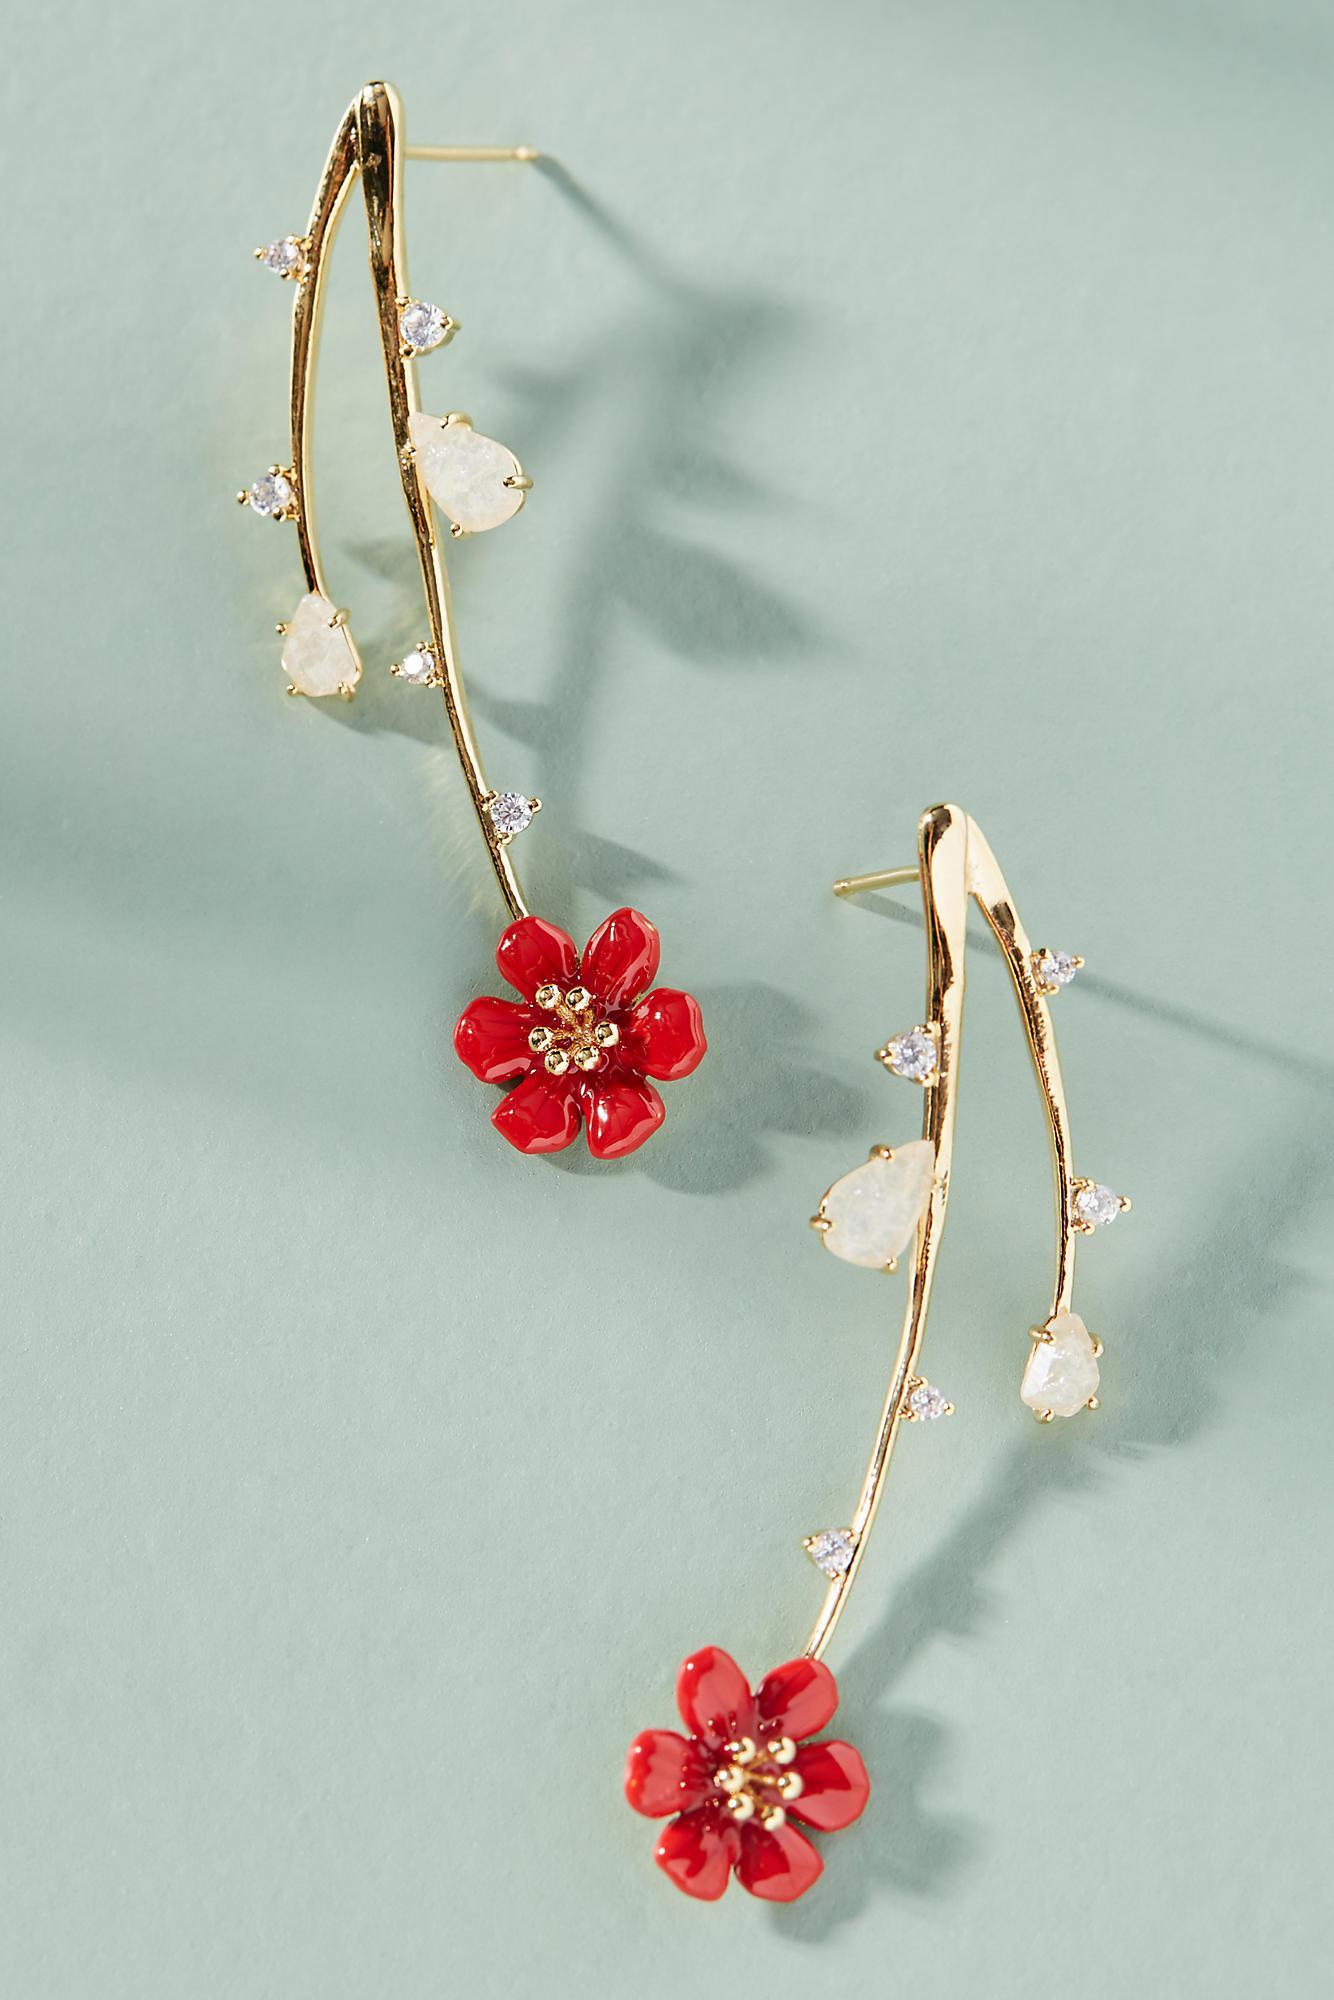 Anthropologie Cascading Flowers Drop Earrings uQISIJ54o